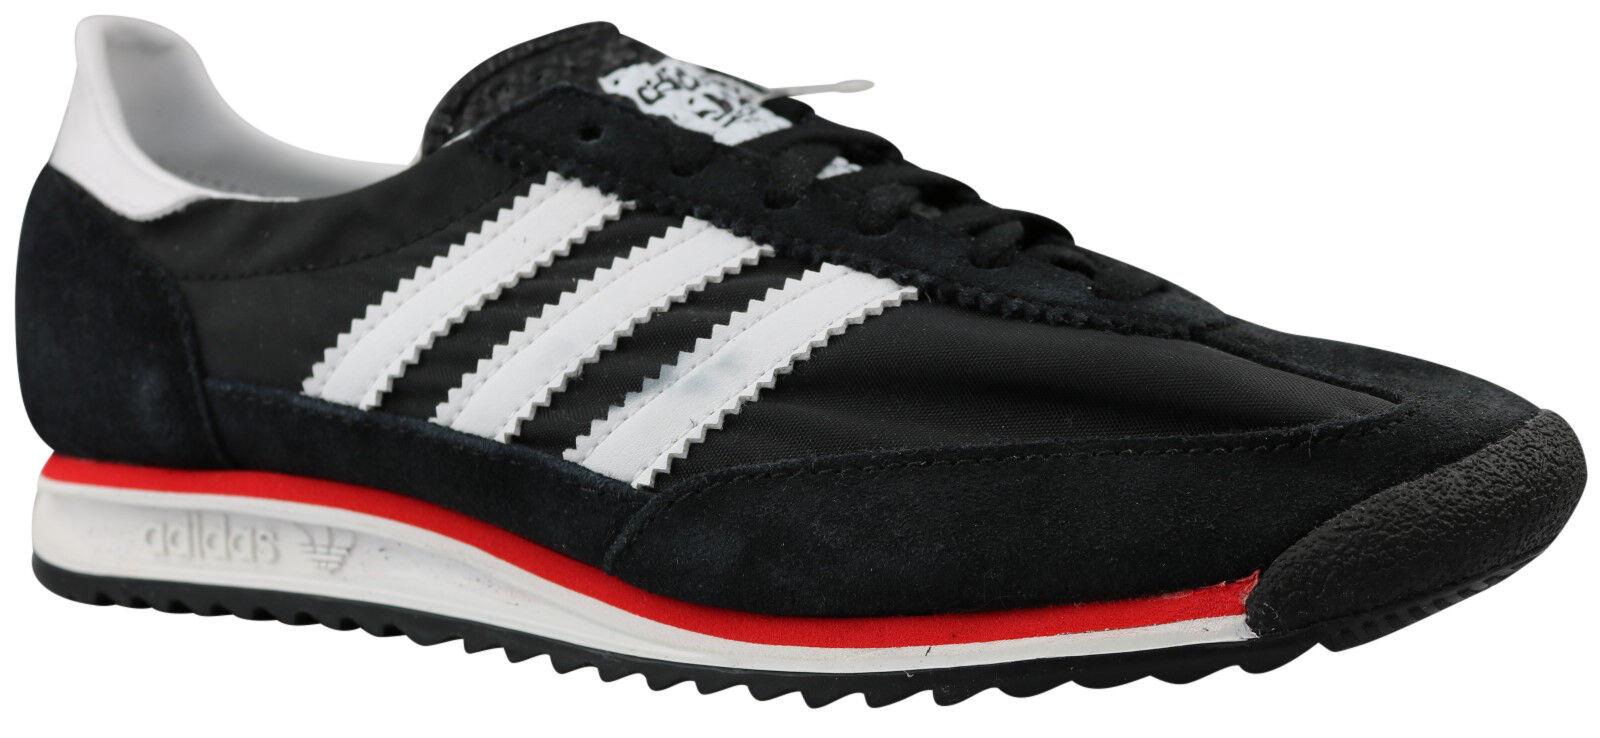 Adidas Originals SL 72 Turnschuhe Schuhe S78997 schwarz Gr. 36 45 46,5 NEU